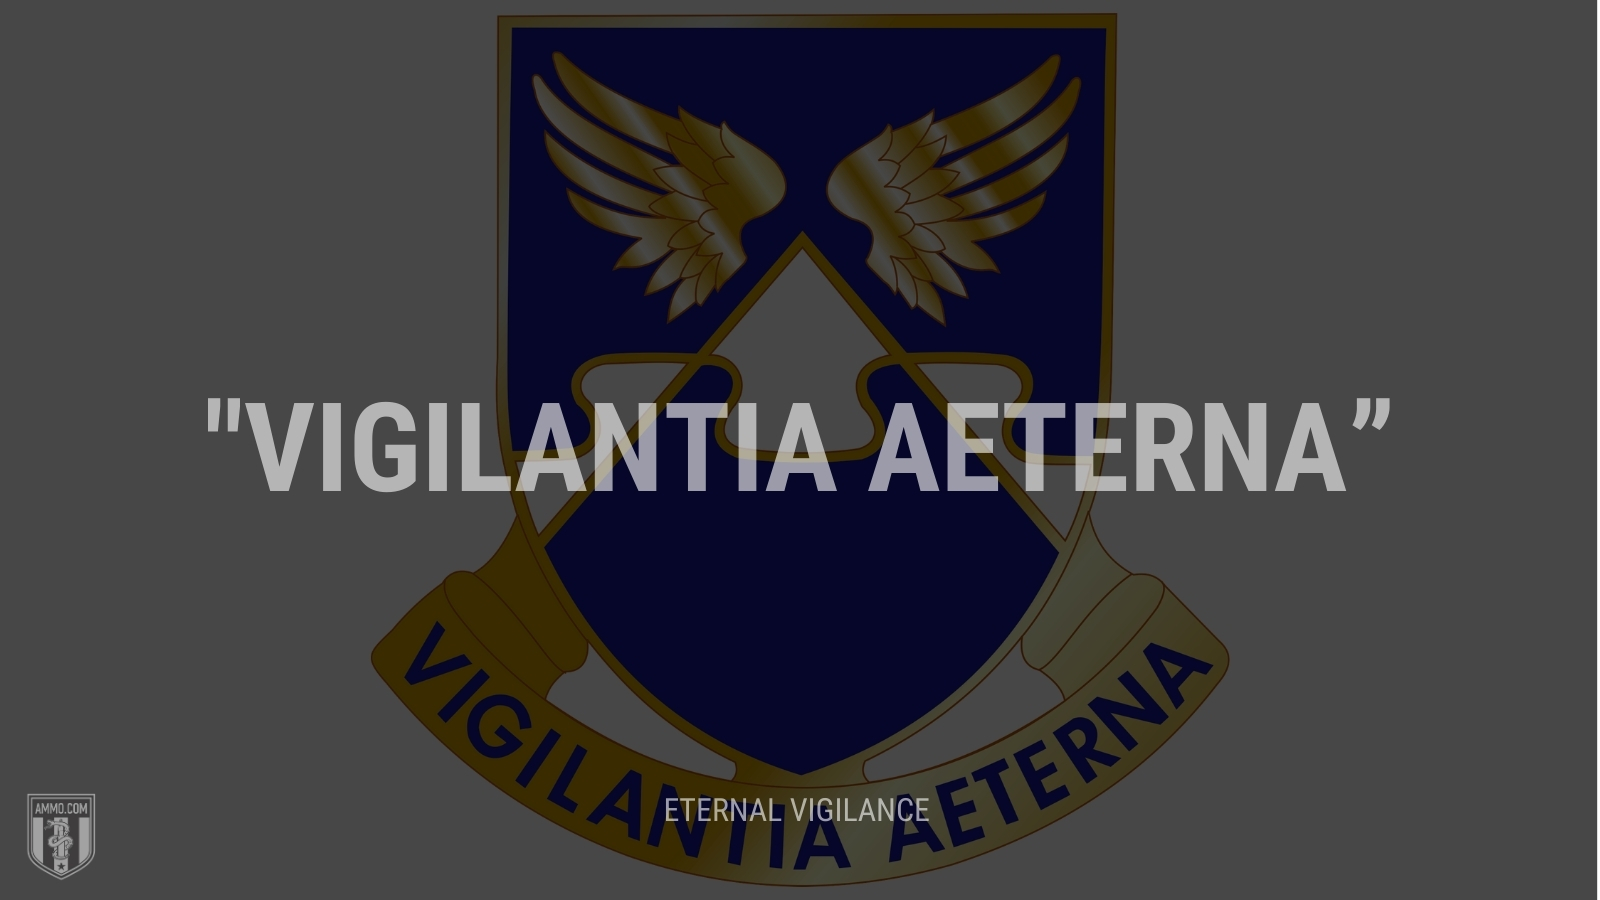 """Vigilantia aeterna"" - Eternal vigilance"